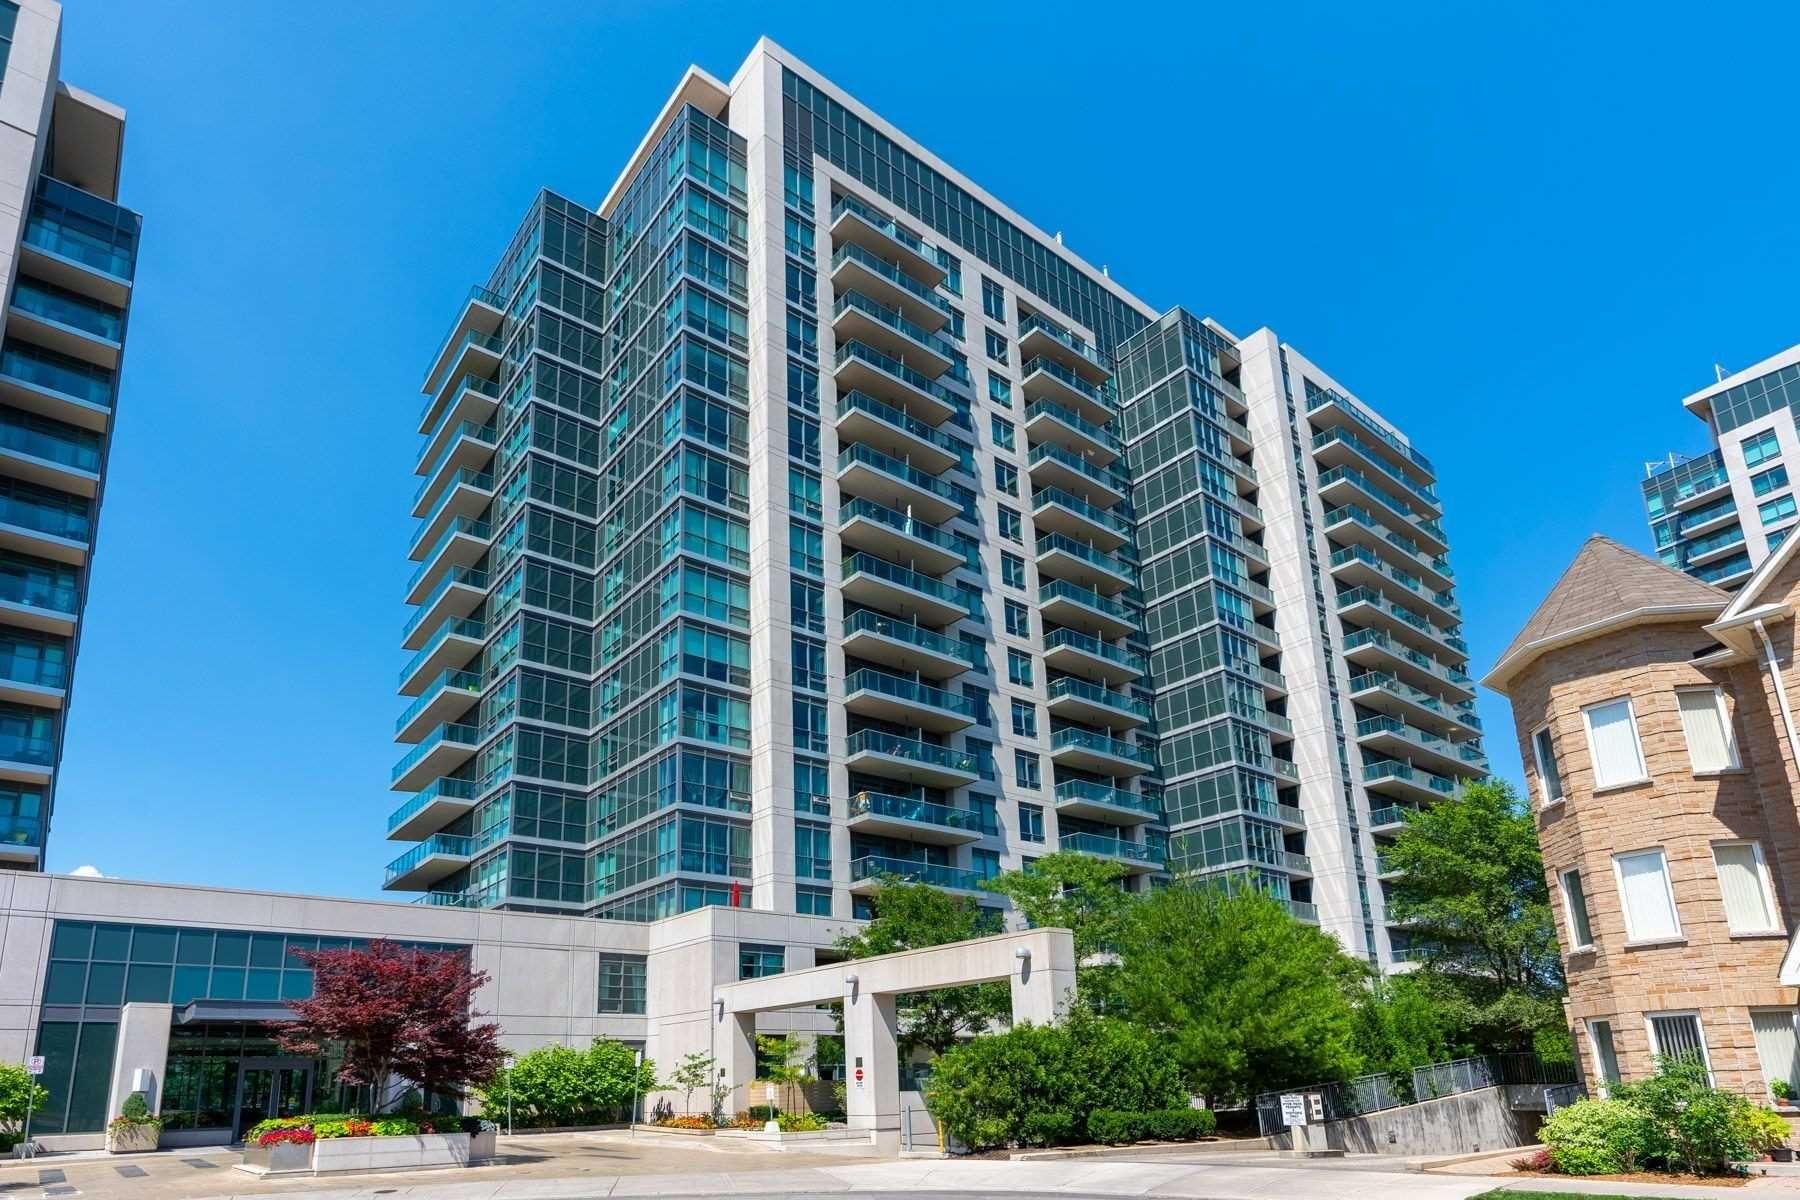 Main Photo: 409 35 Brian Peck Crescent in Toronto: Thorncliffe Park Condo for sale (Toronto C11)  : MLS®# C4839136